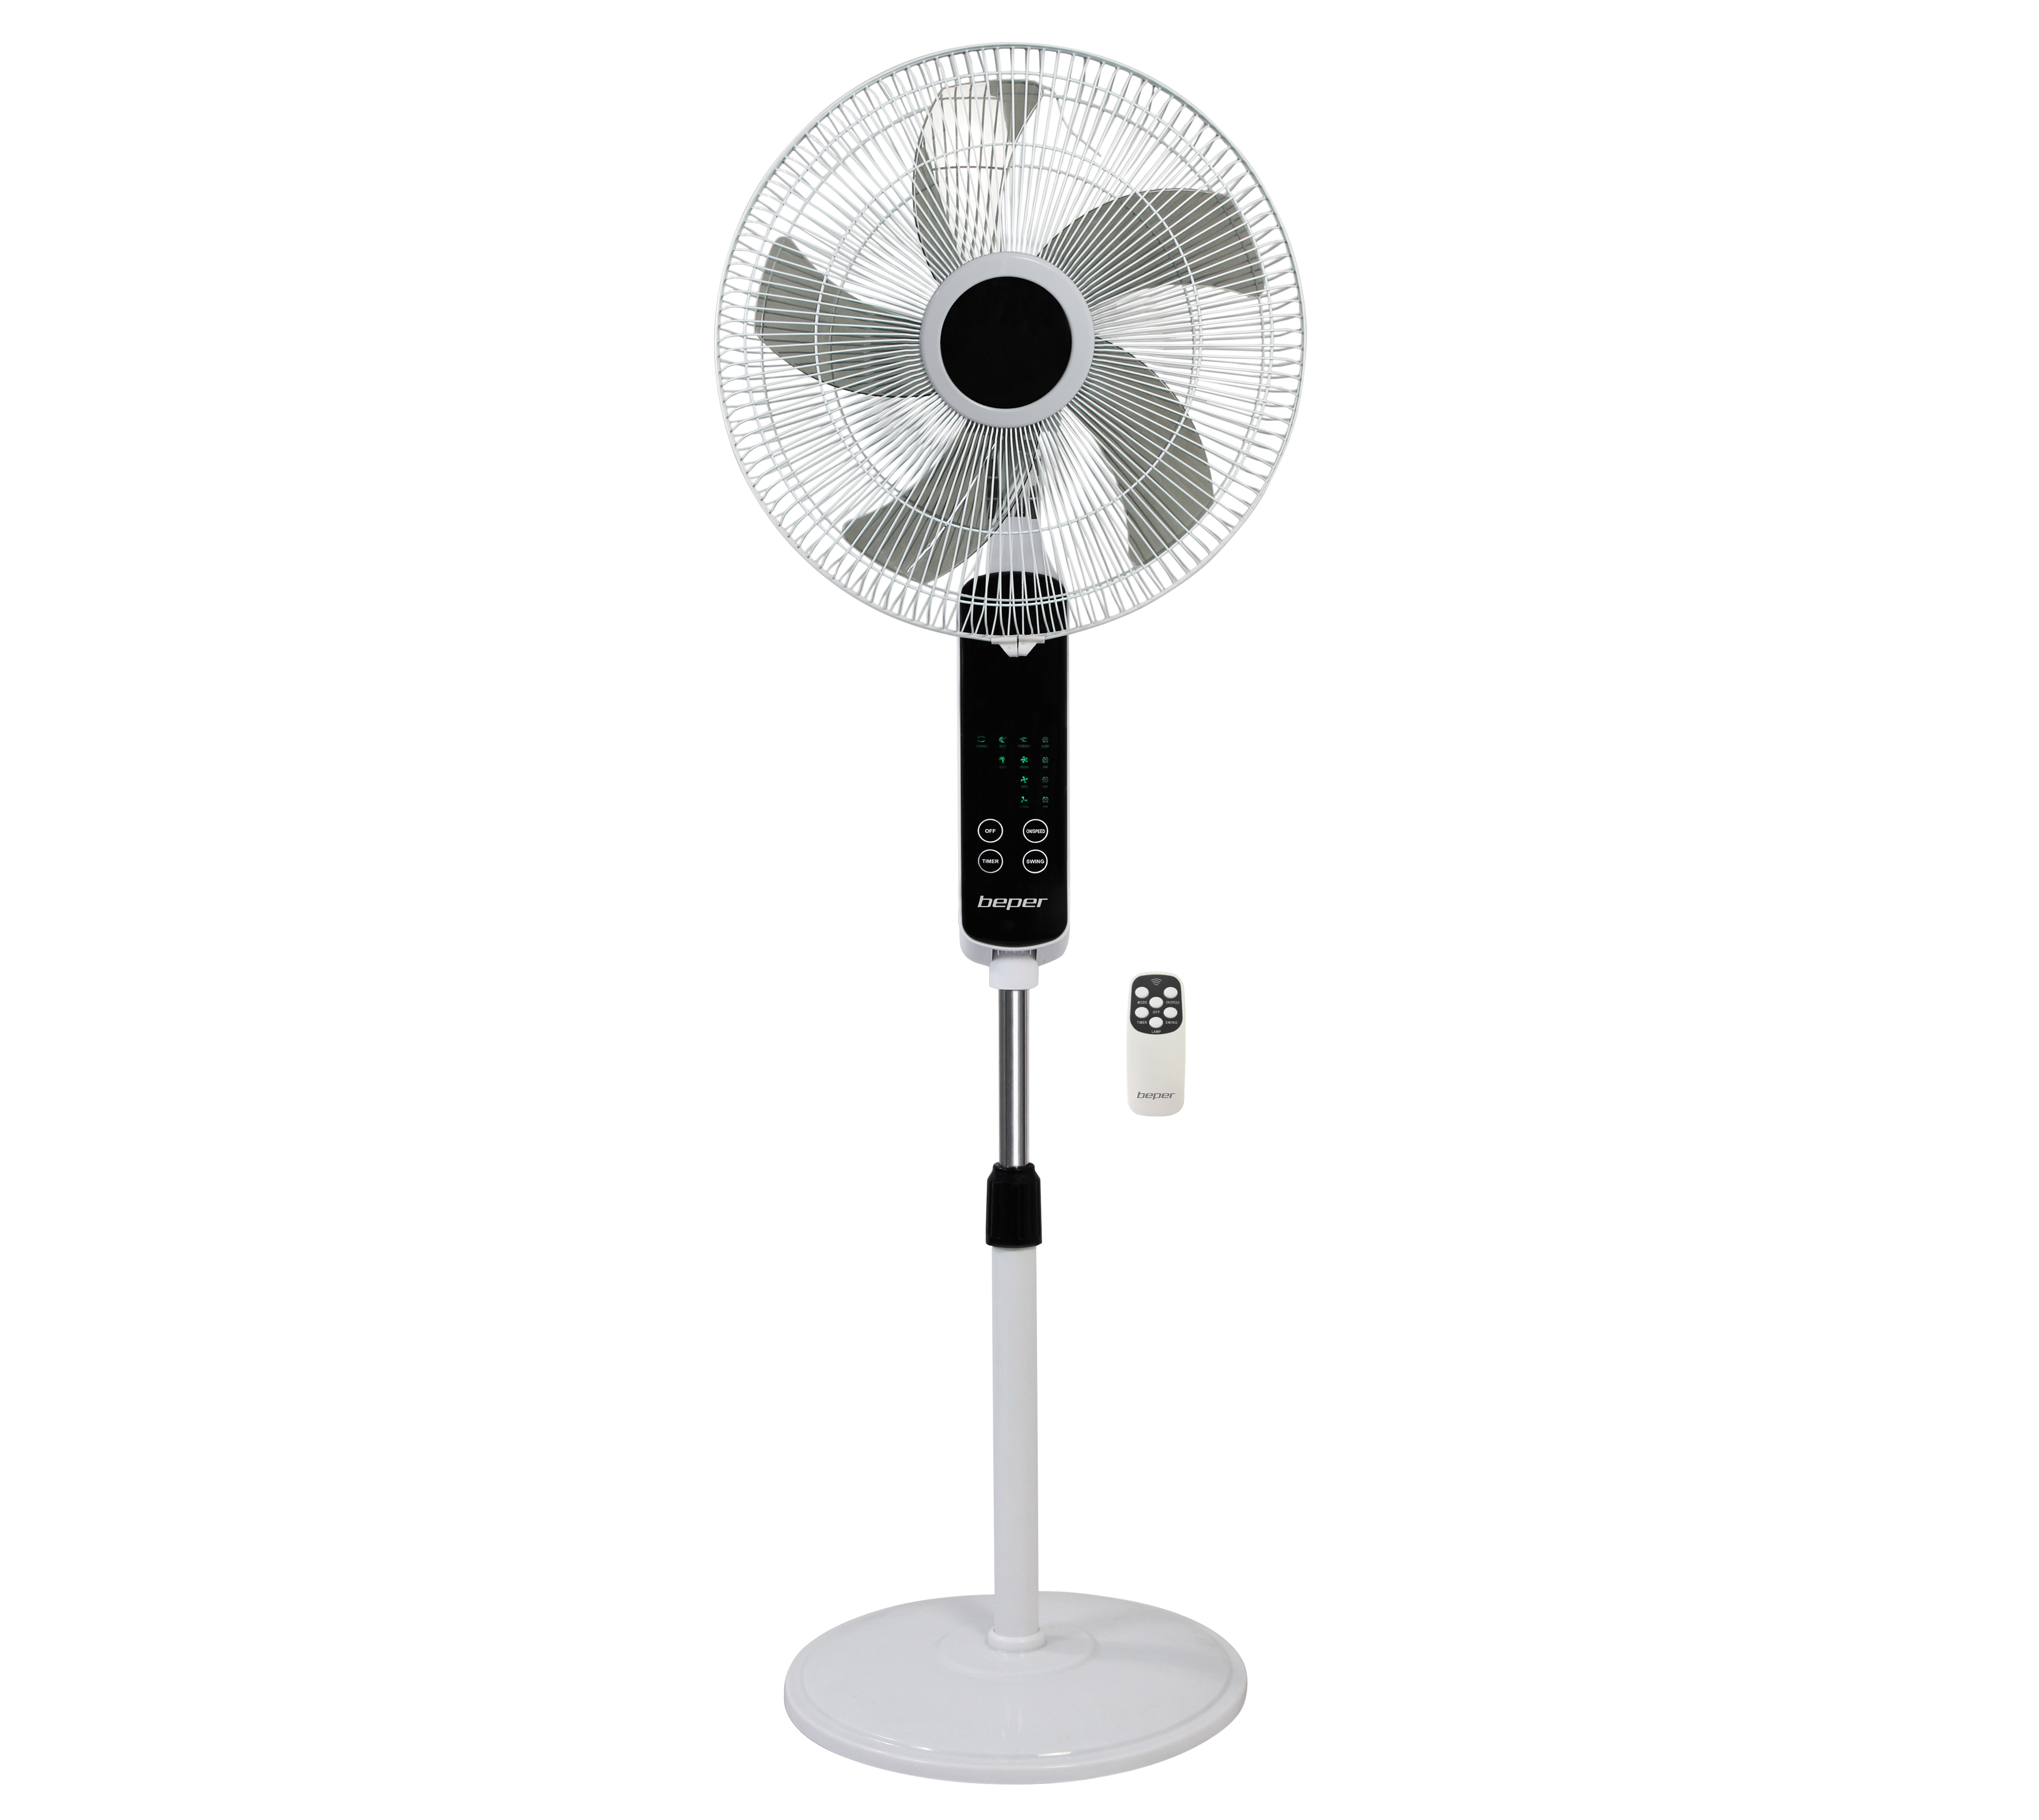 BEPER VE112 stojanový ventilátor s dotykovým displejem, 55W